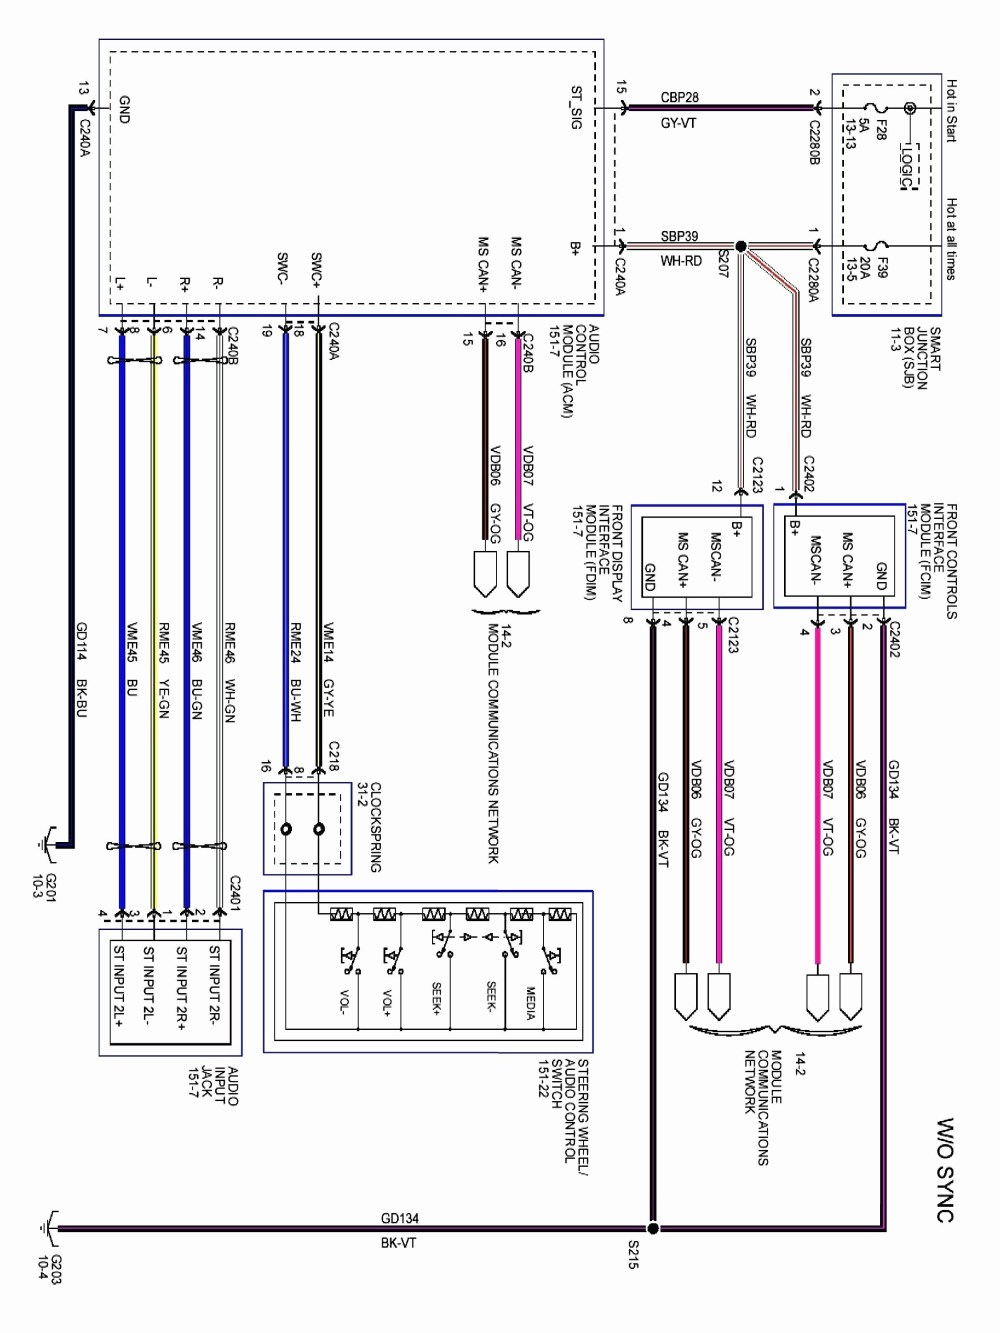 medium resolution of car labeled diagram wiring diagram in a car valid wiring diagram for amplifier car of car